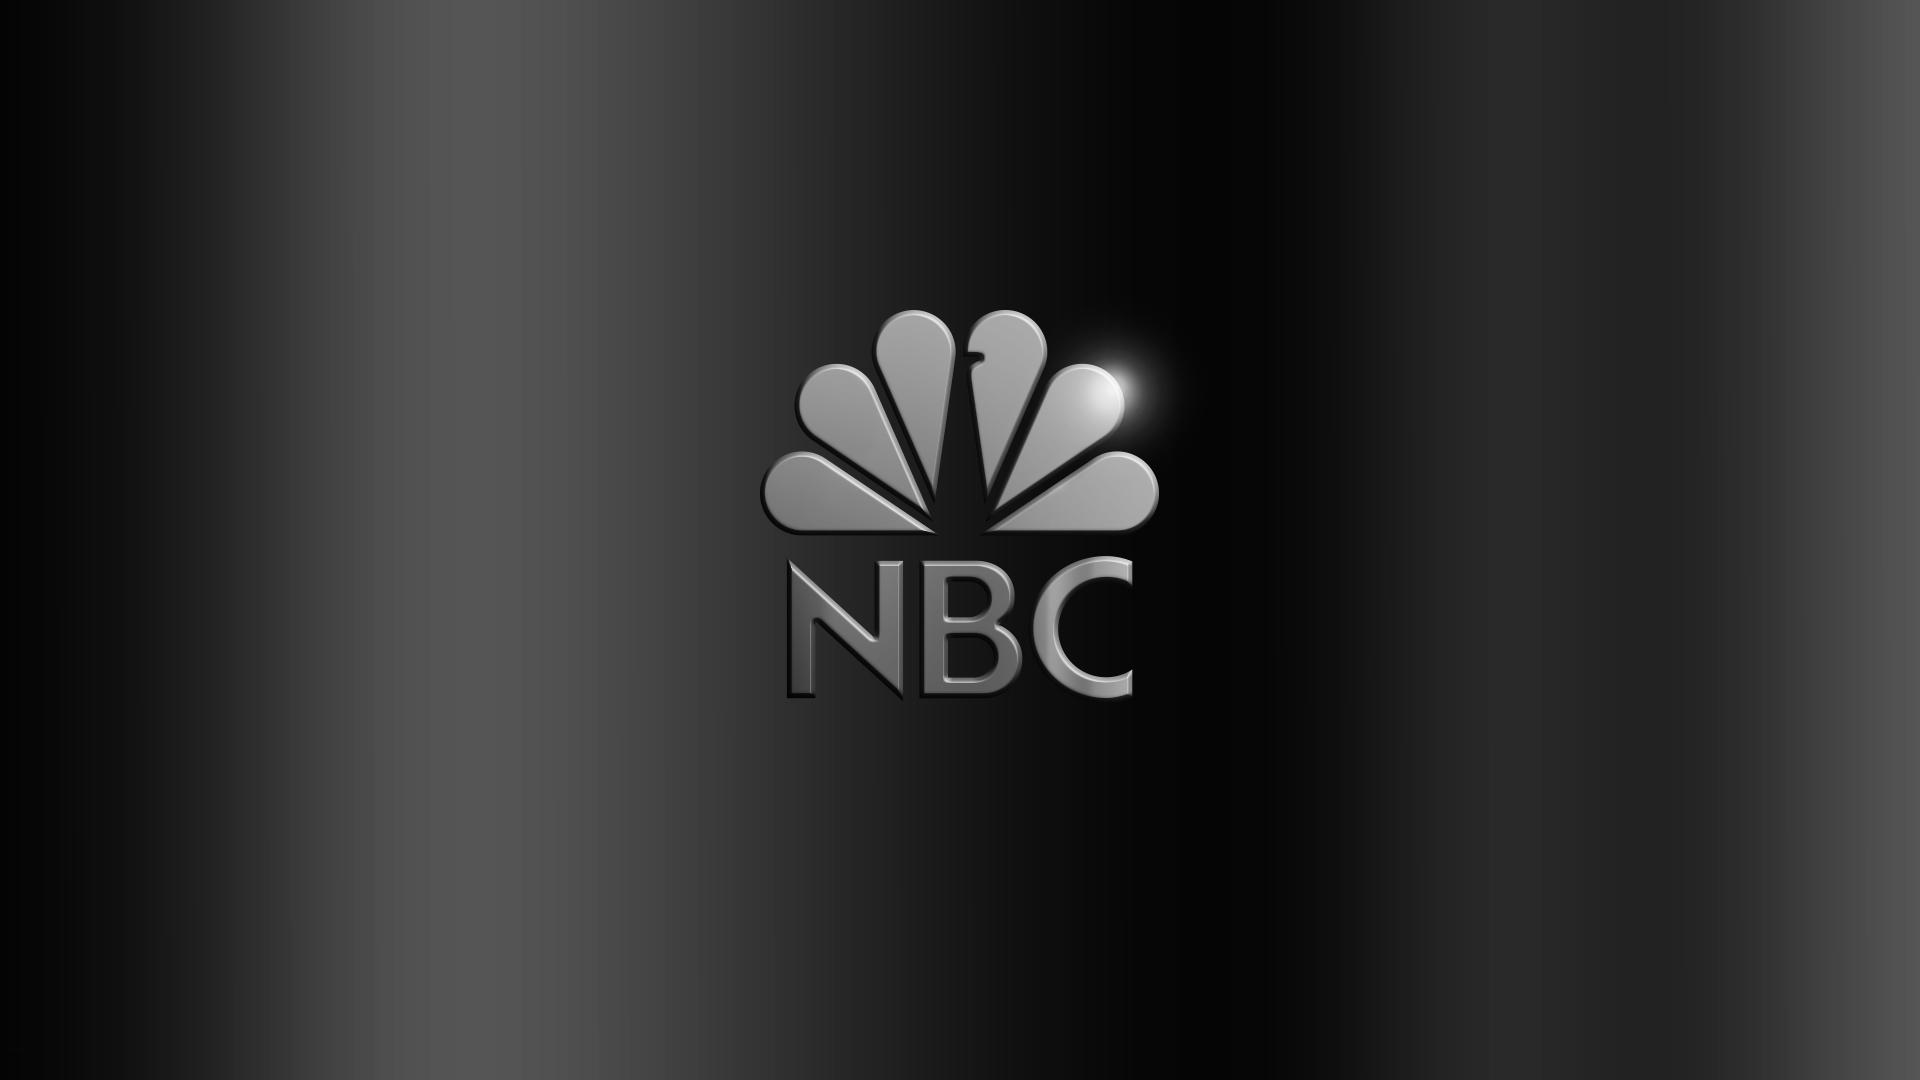 NBC LOGO 10.jpg